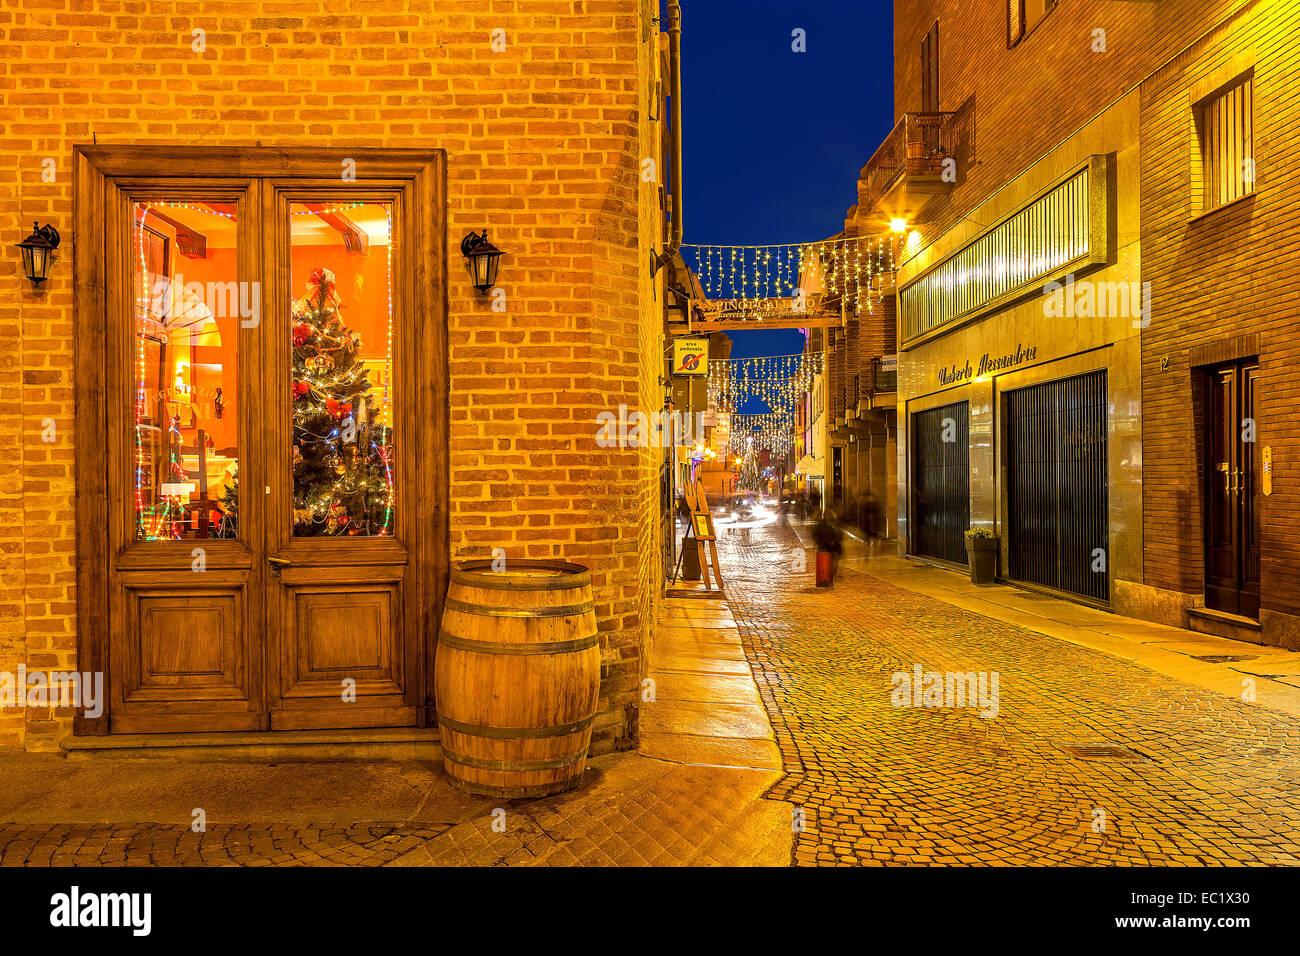 Street of Alba at night. - Stock Image